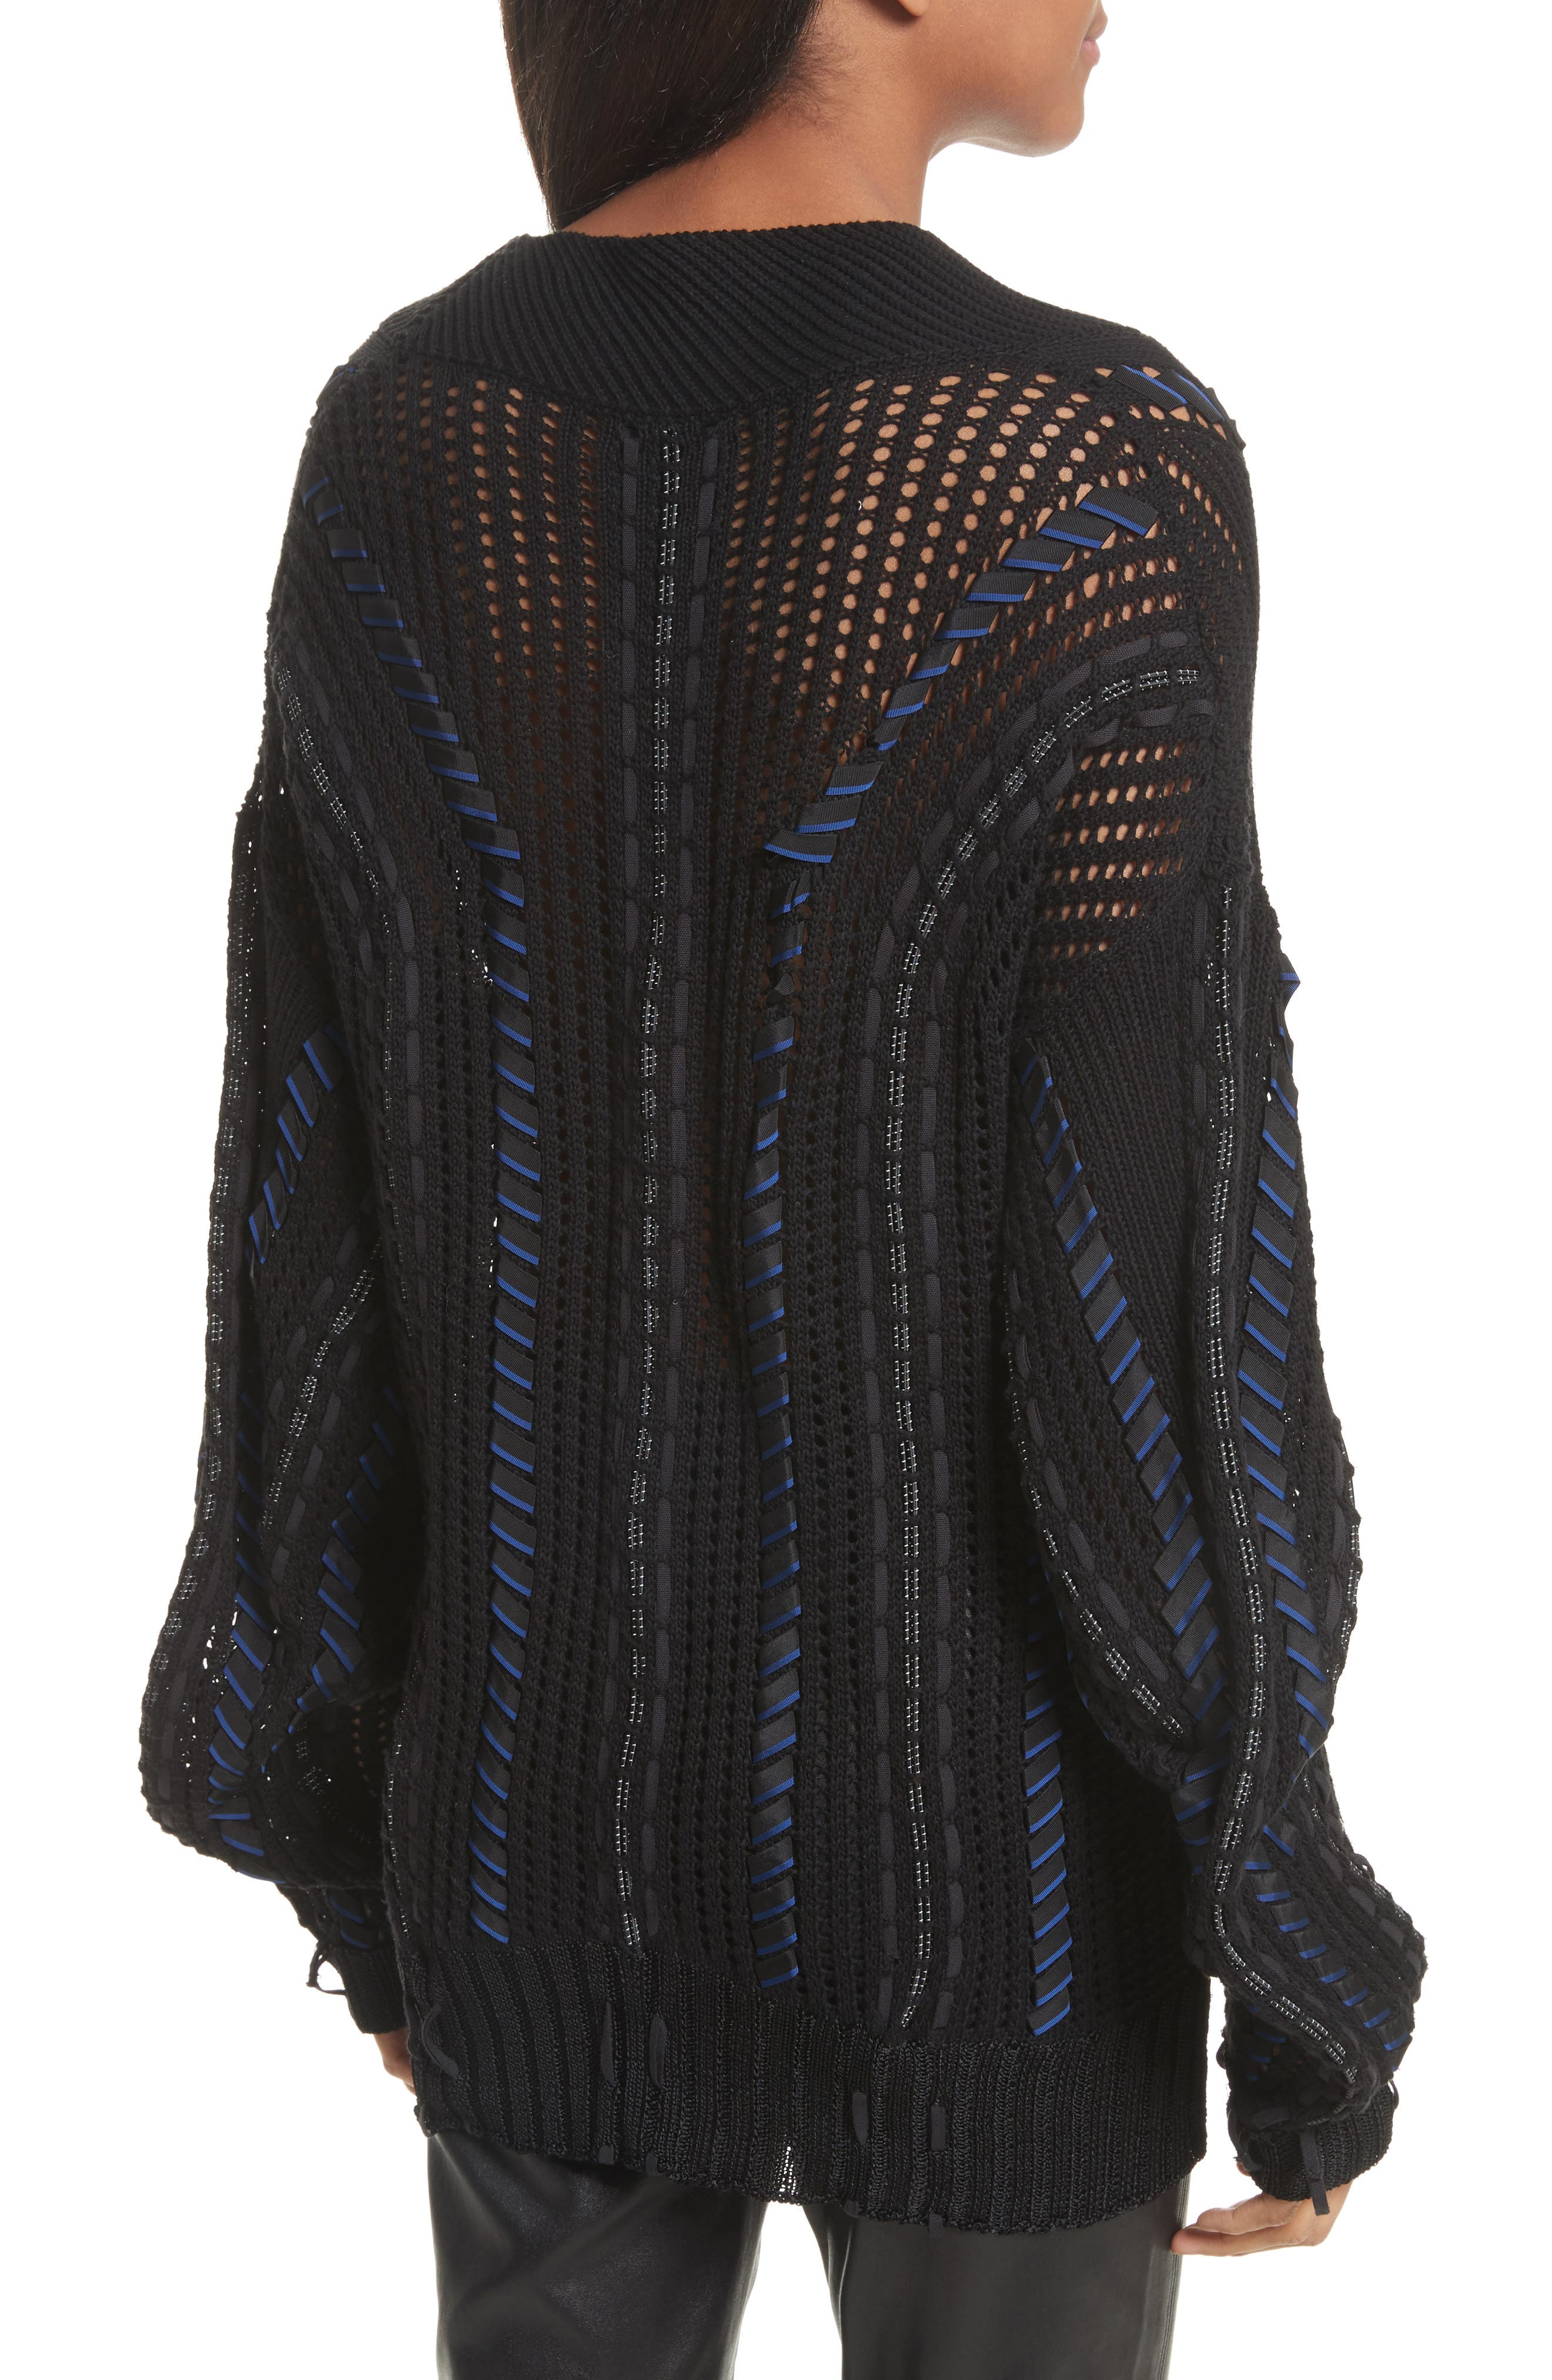 Lucie Pointelle Knit Cotton Blend Sweater,                             Alternate thumbnail 2, color,                             001